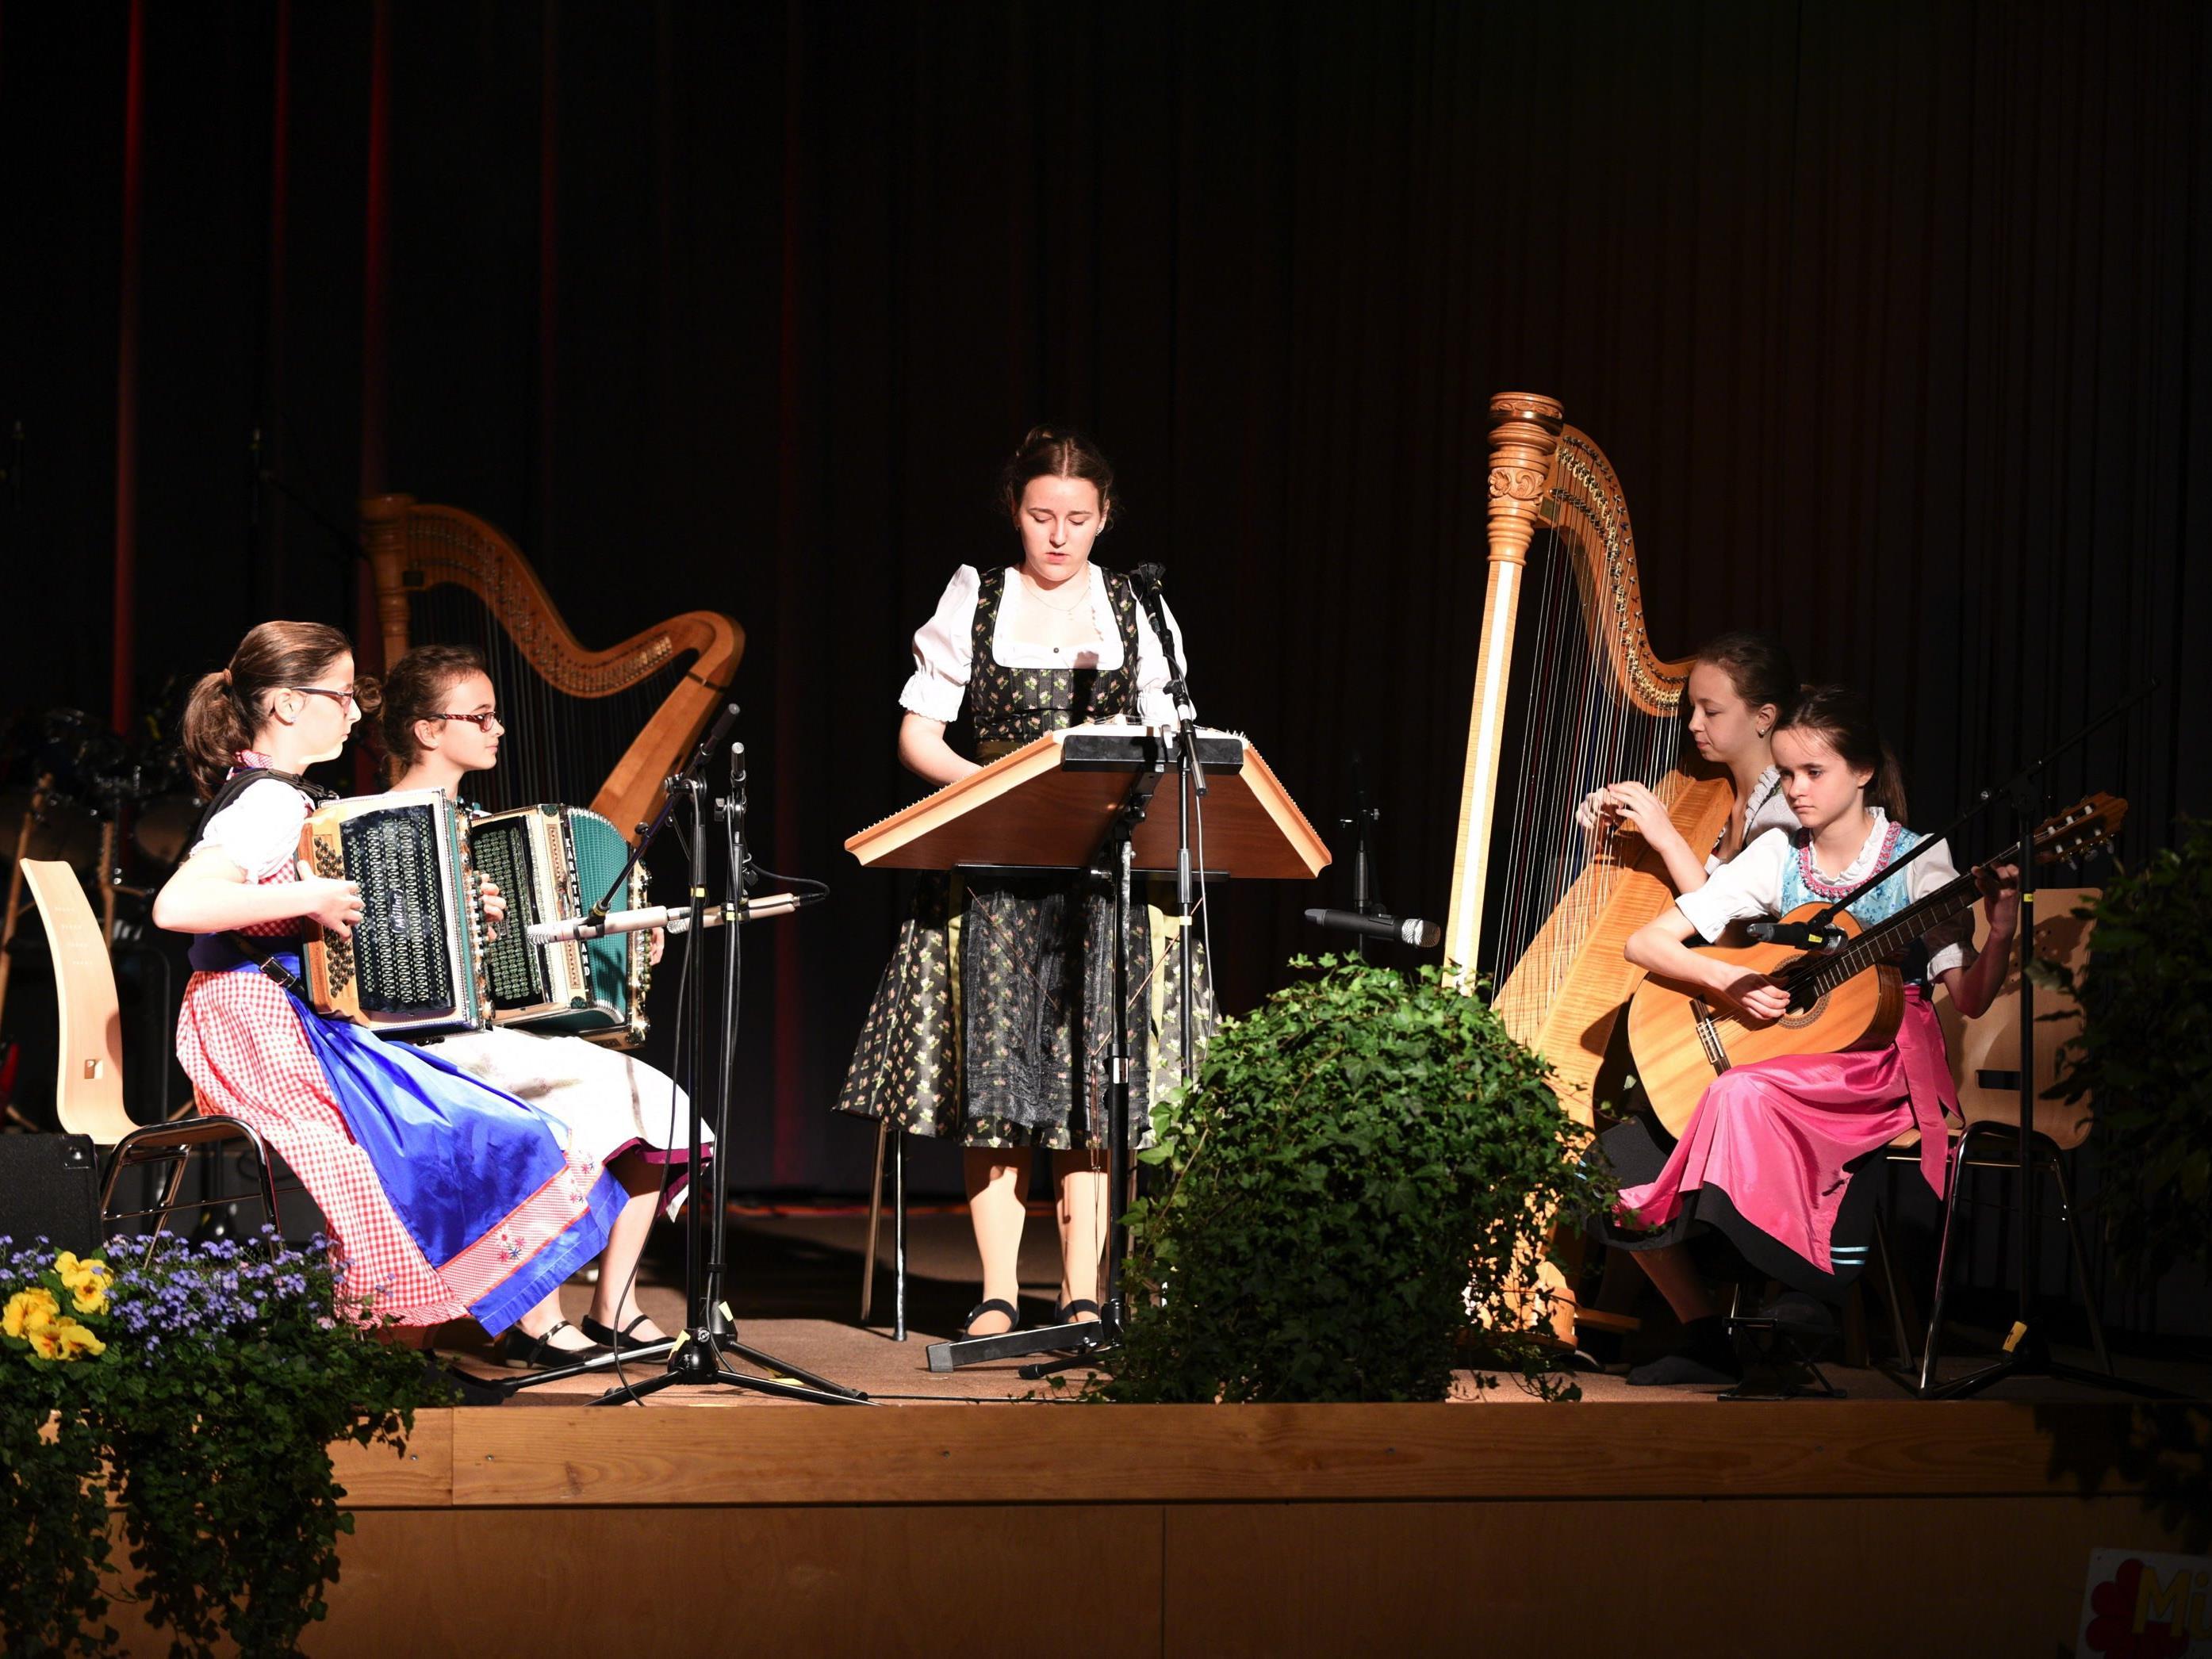 Frühjahrskonzert der Musikmittelschule Thüringen